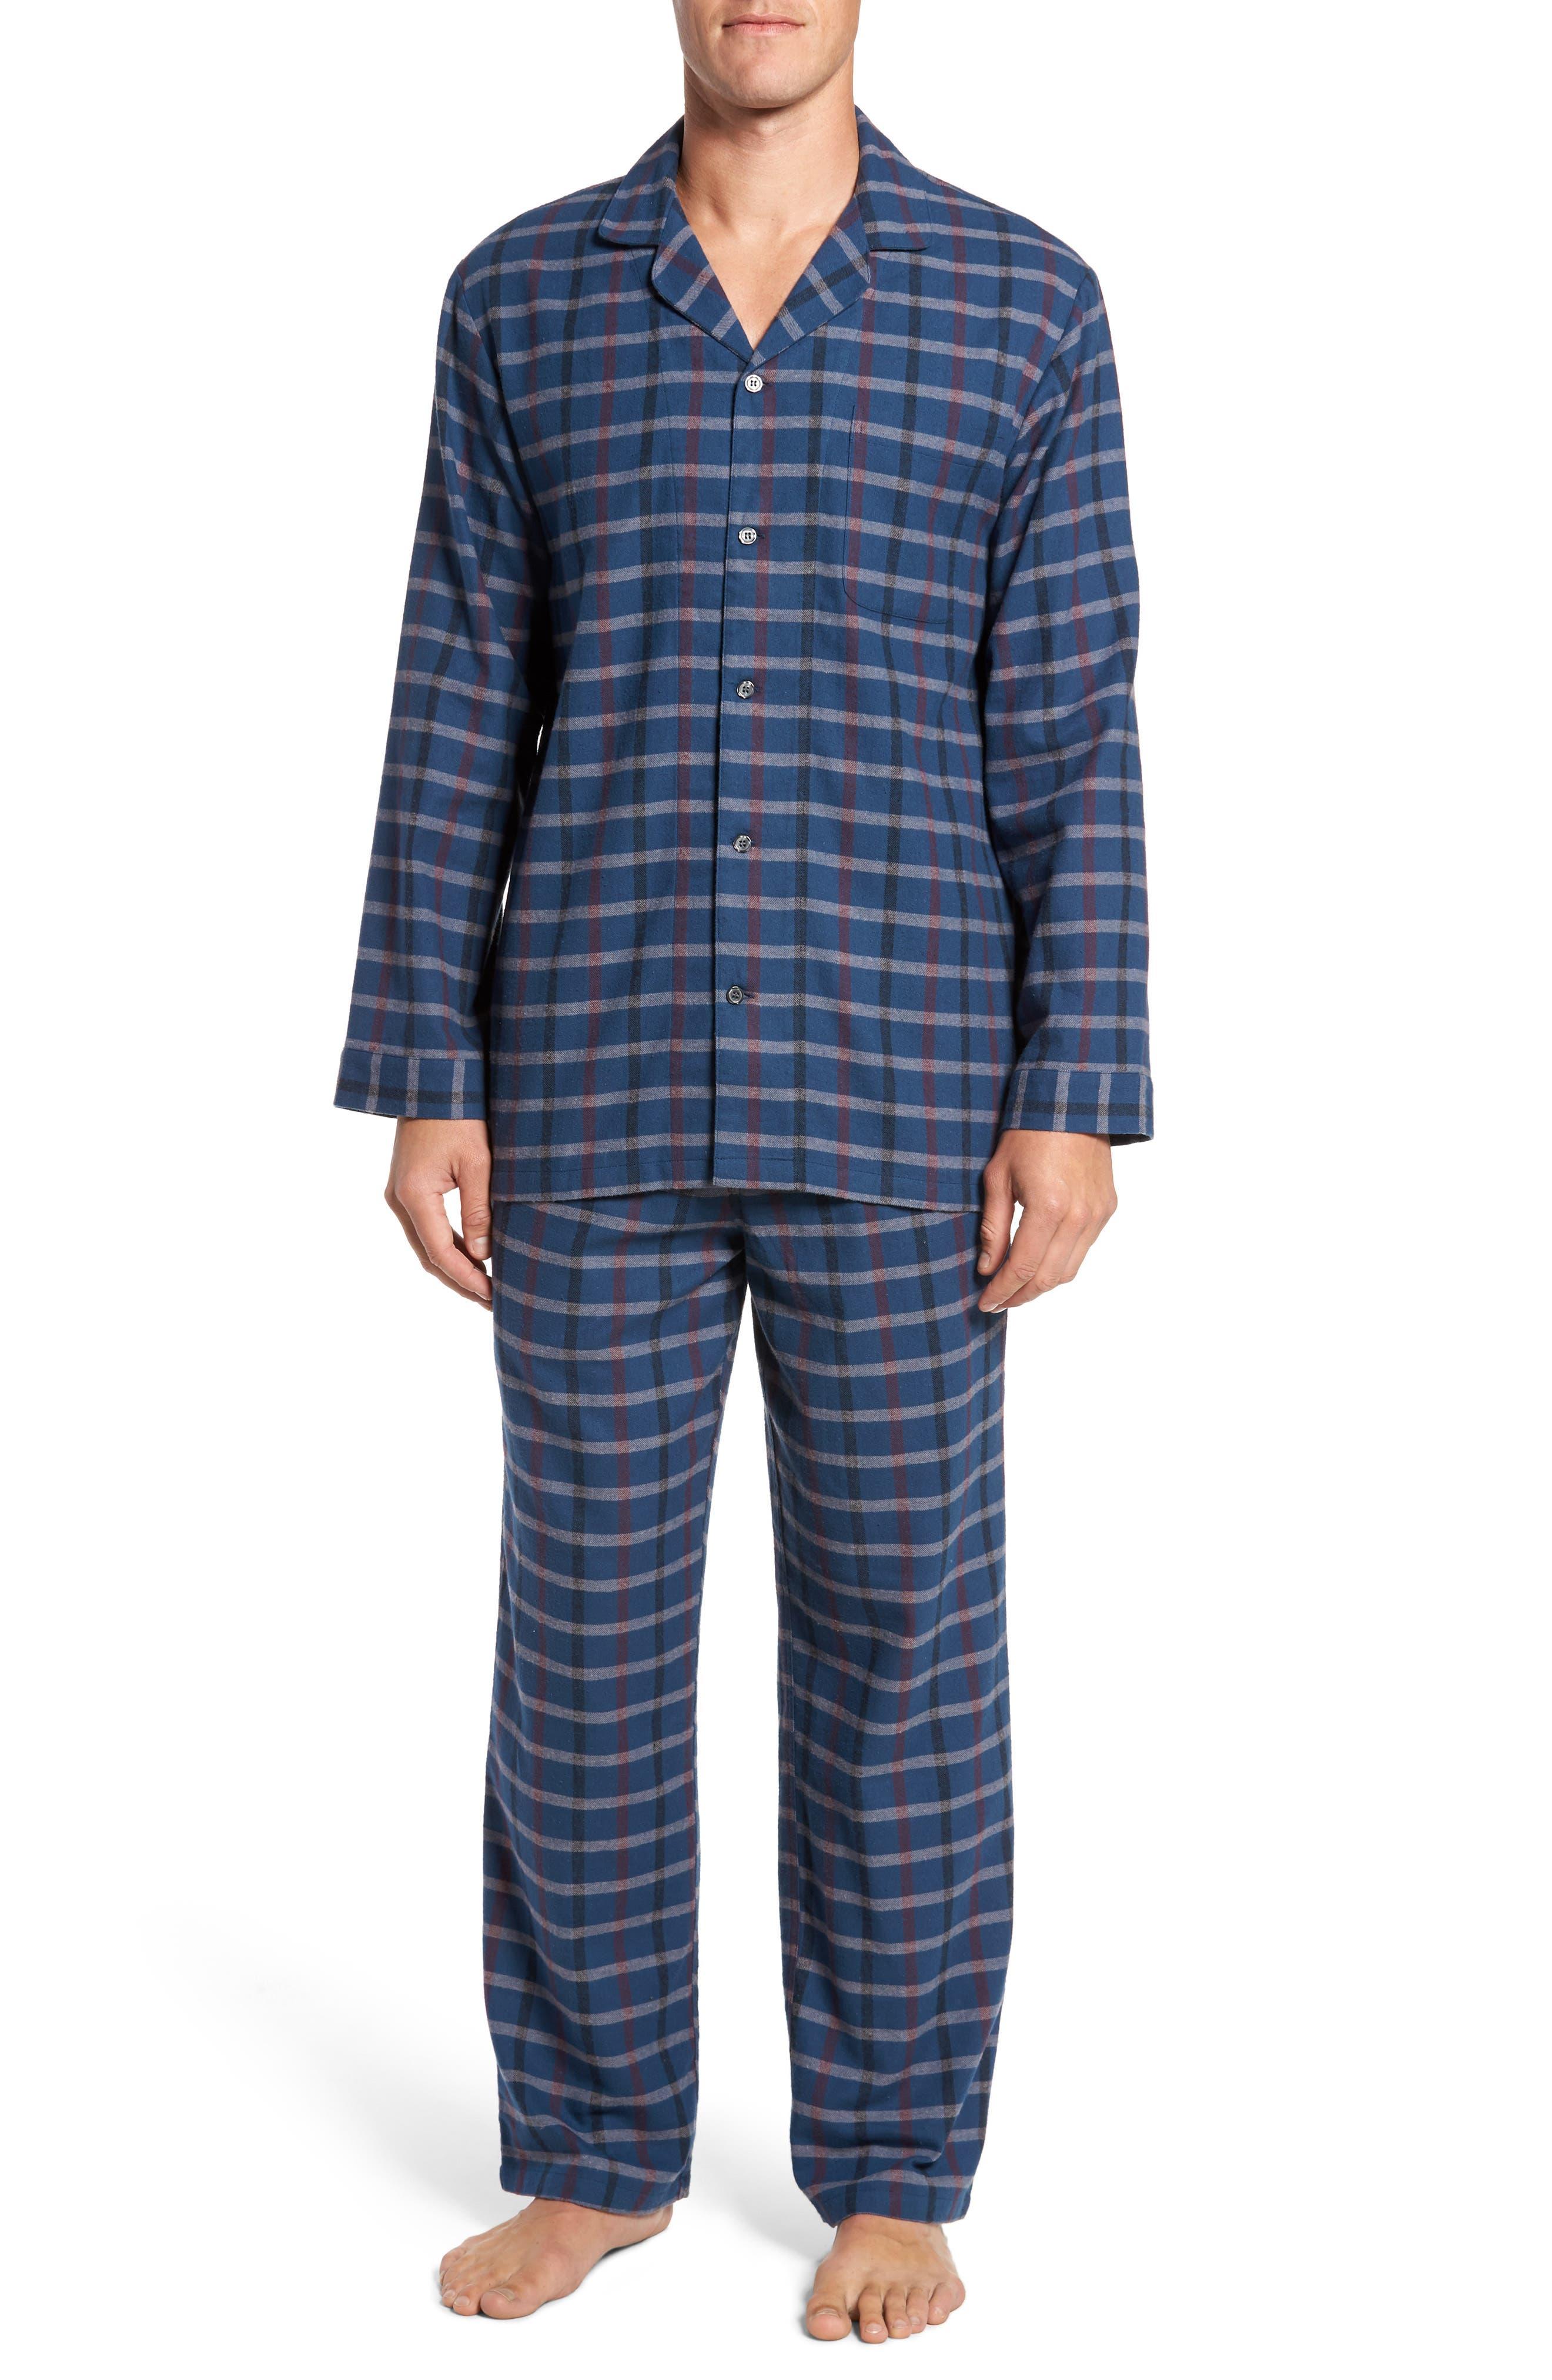 '824' Flannel Pajama Set,                             Main thumbnail 10, color,